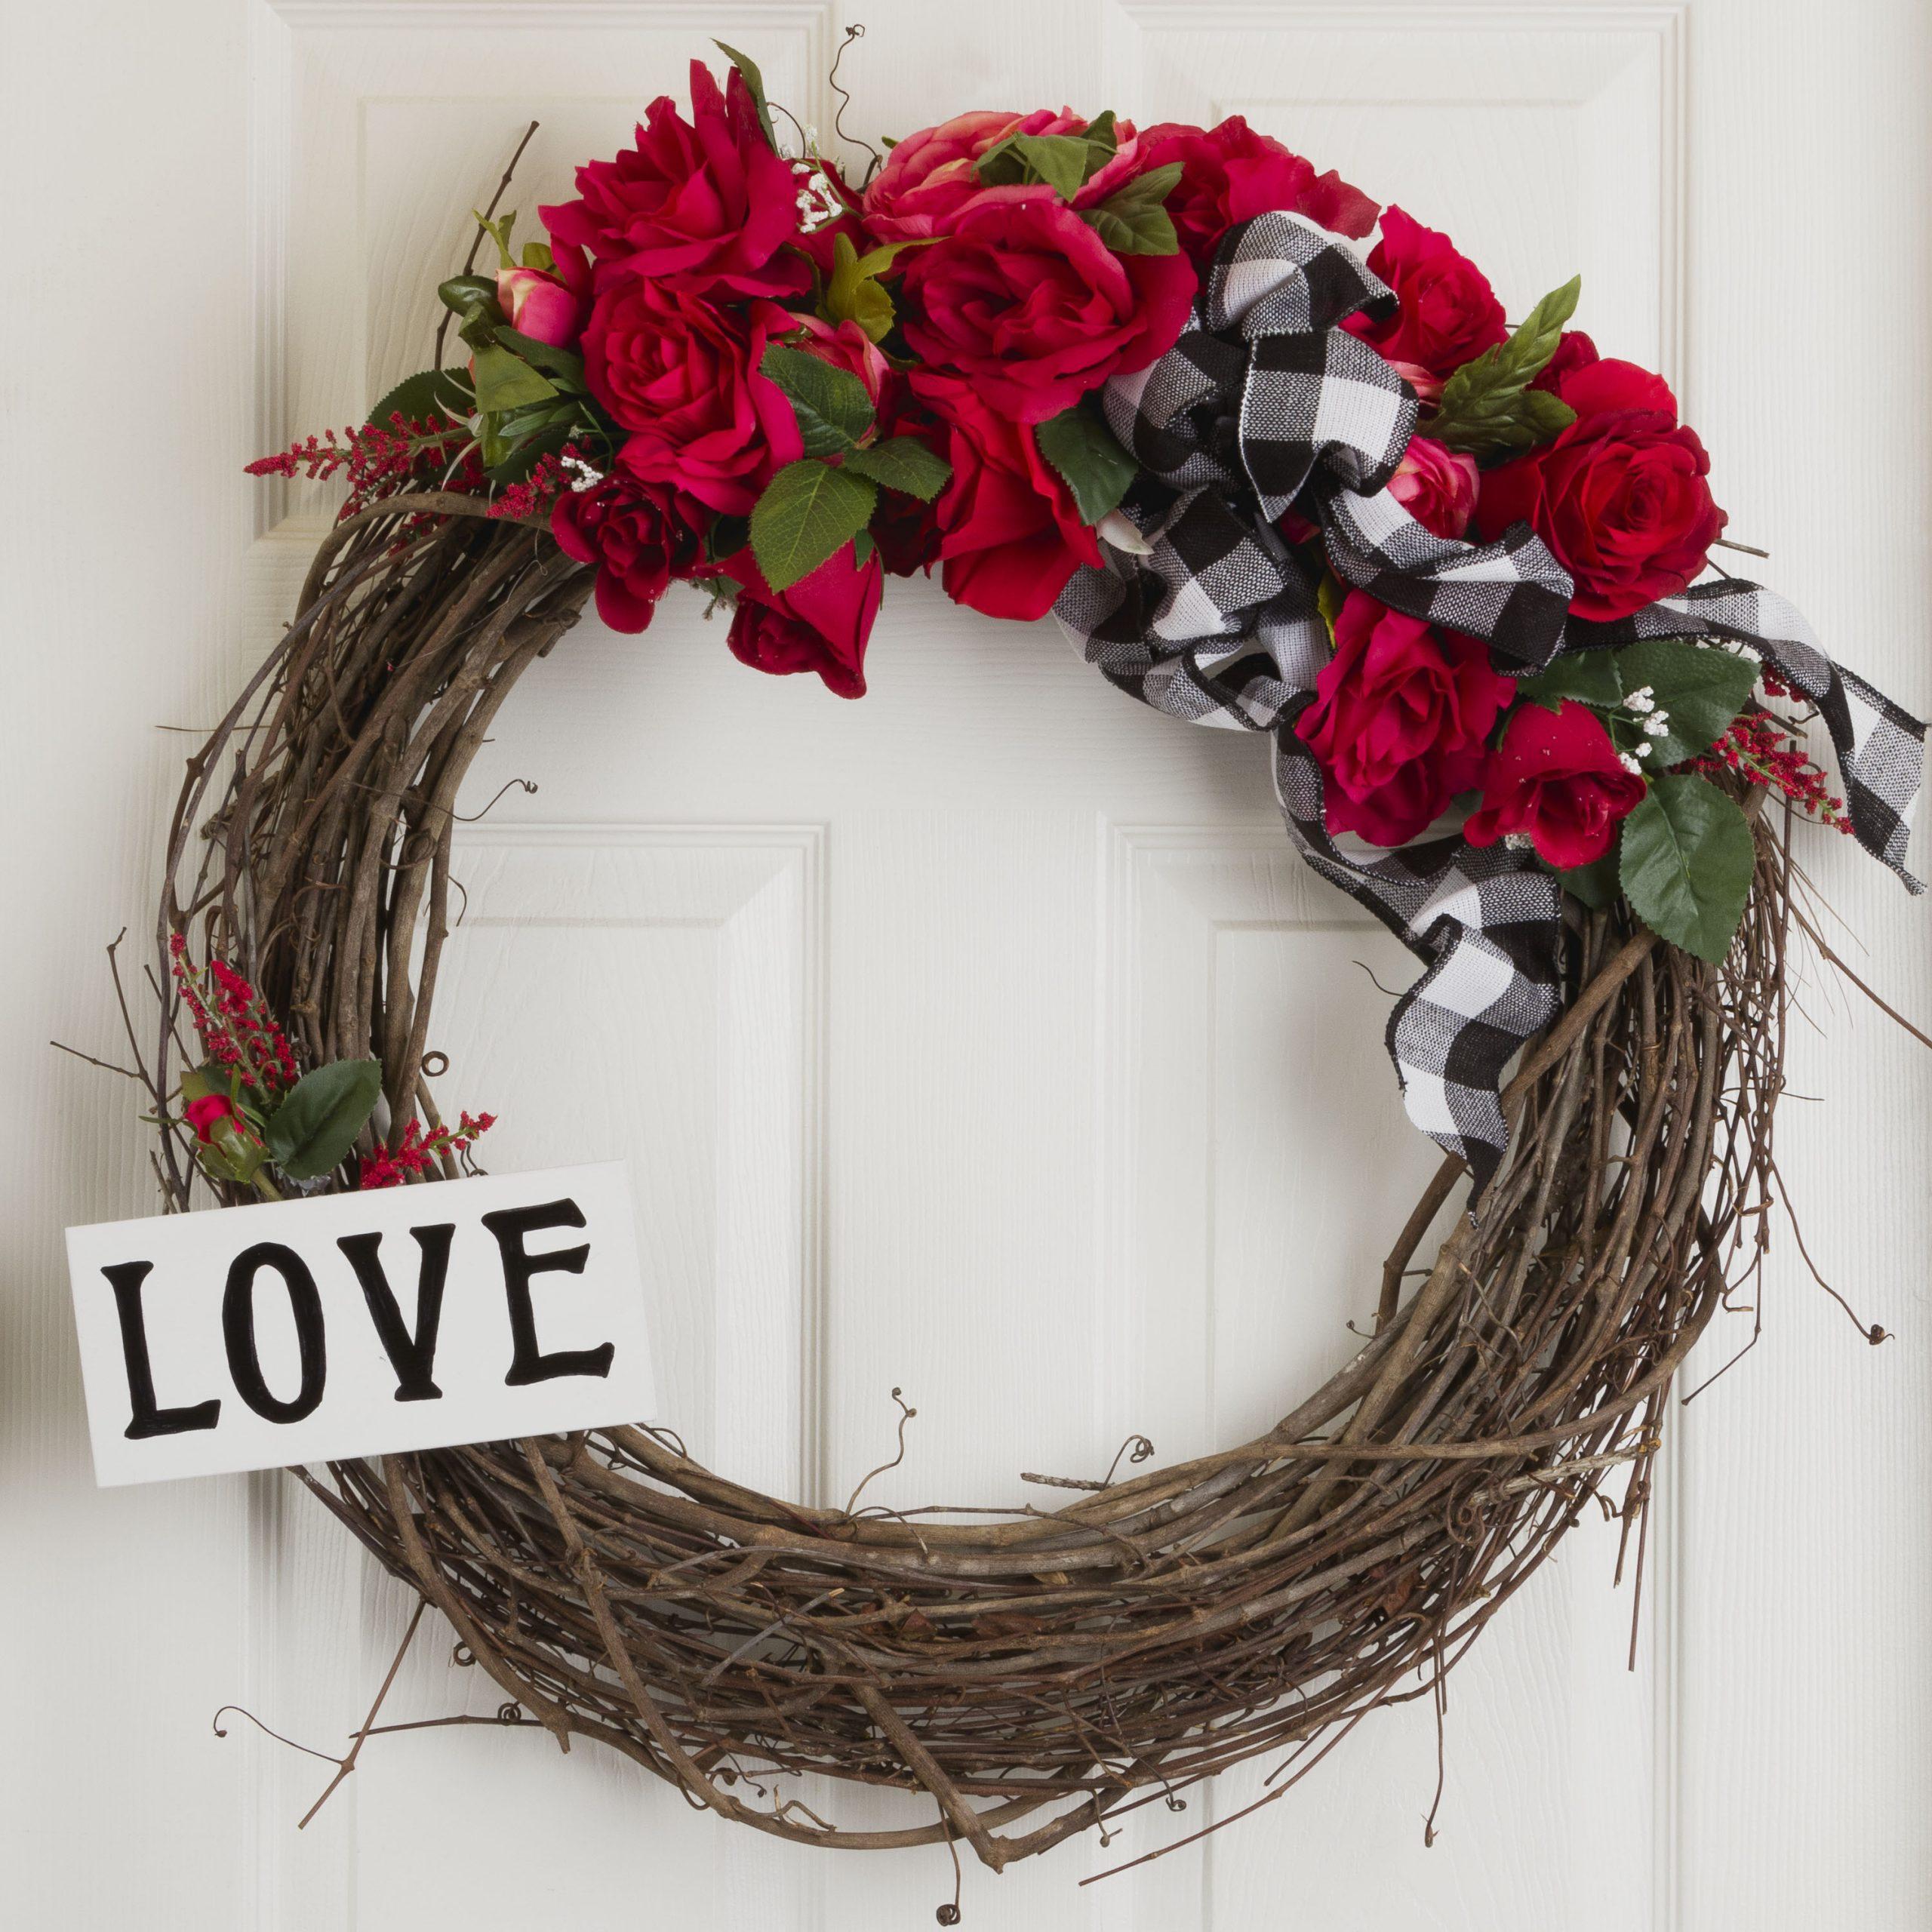 Valentine's Wreath DIY, Easy and Fast DIY, Make a Lovely Wreath, Learn How #wreath #valentinedecor #diy #sign #kippiathome